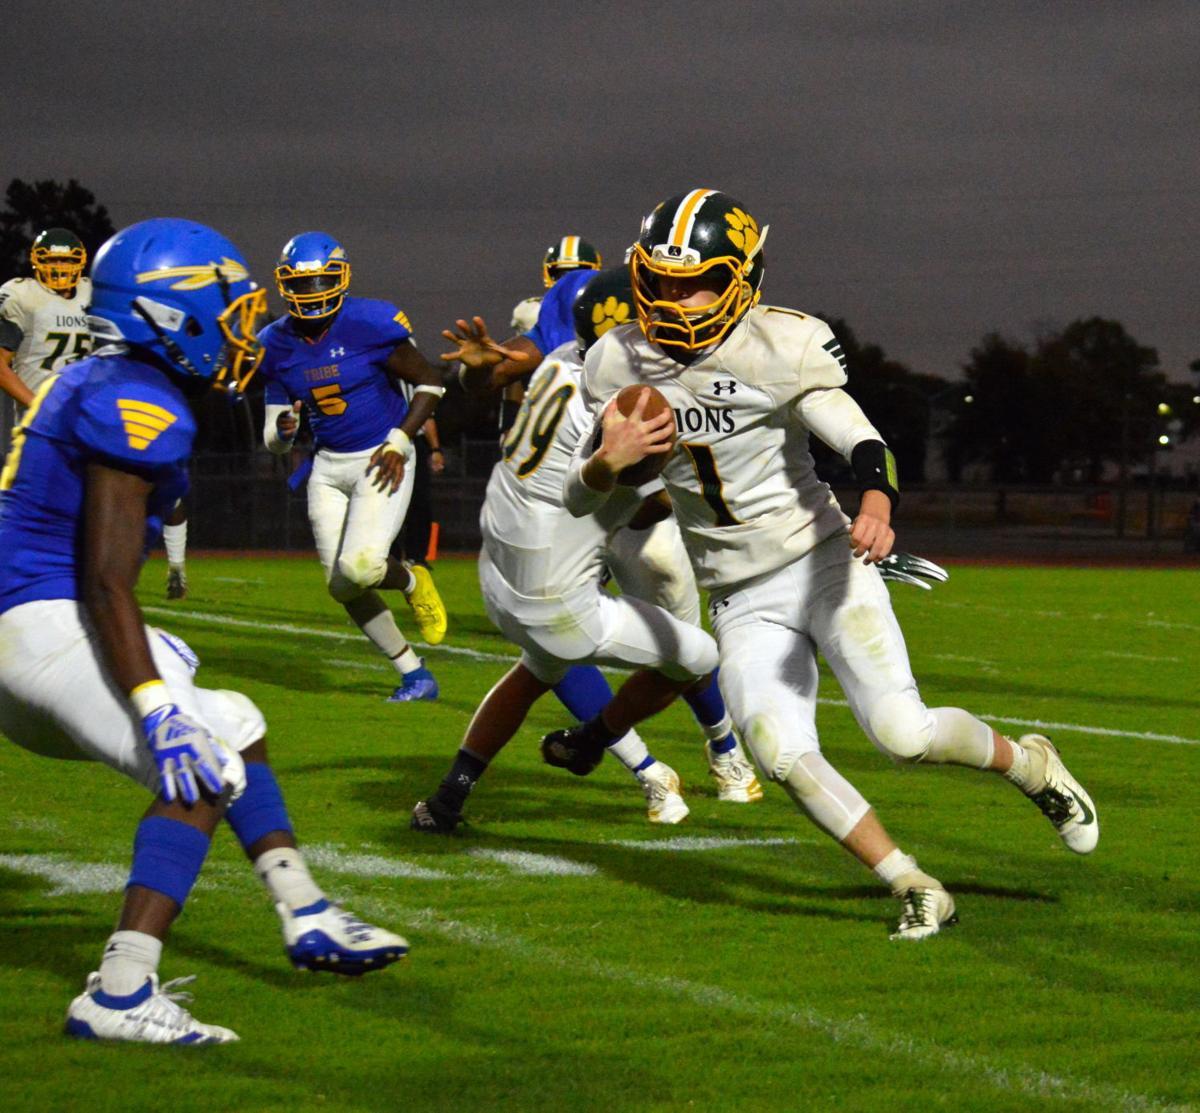 High School Football: Queen Anne's at Wicomico